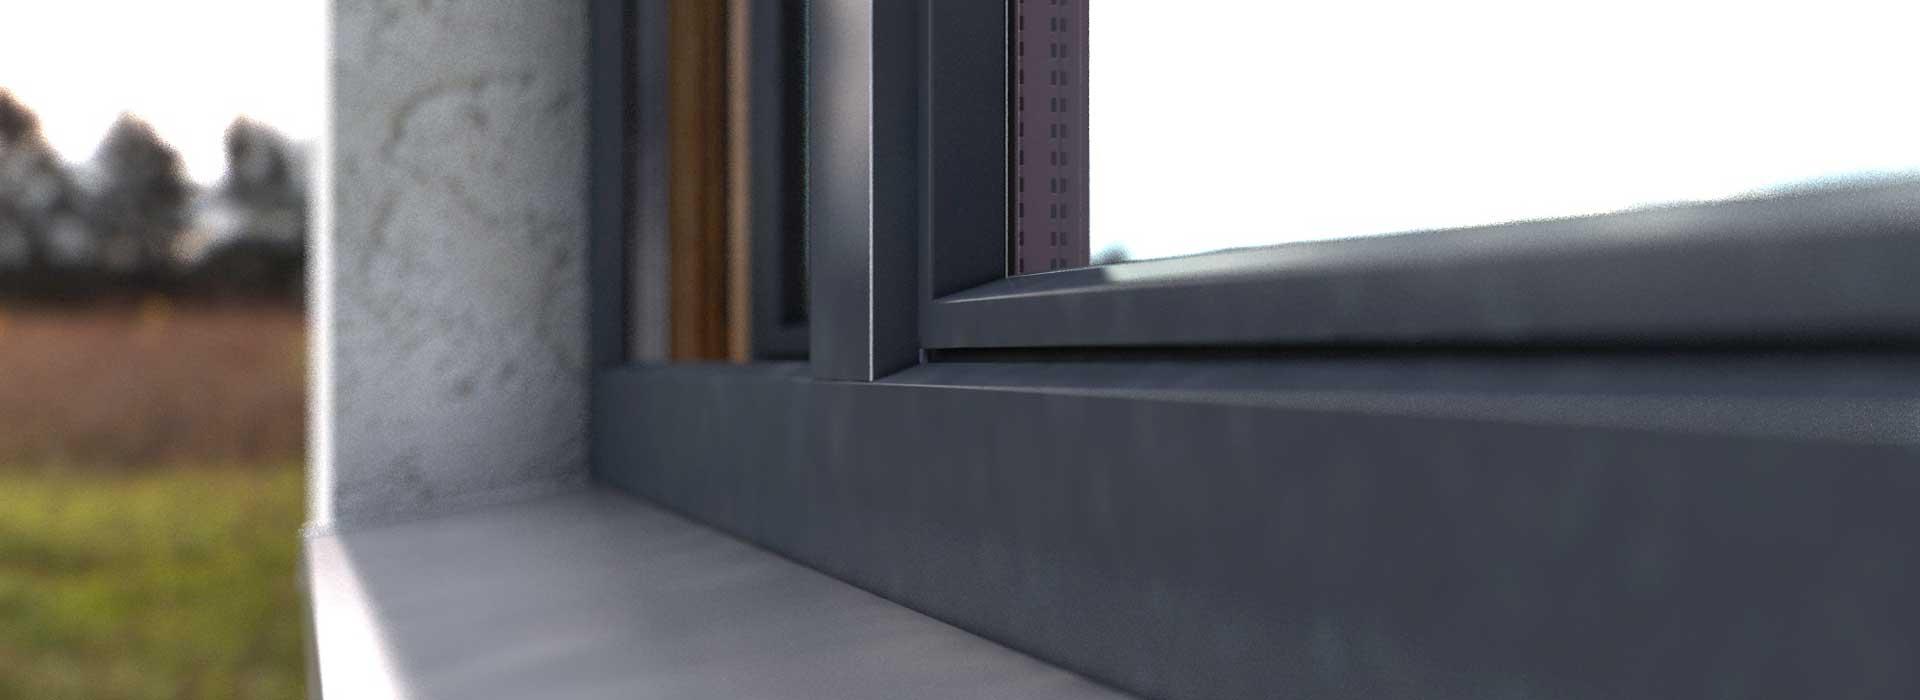 HOLZ BAU ALU - Дерево-алюминиевое окно